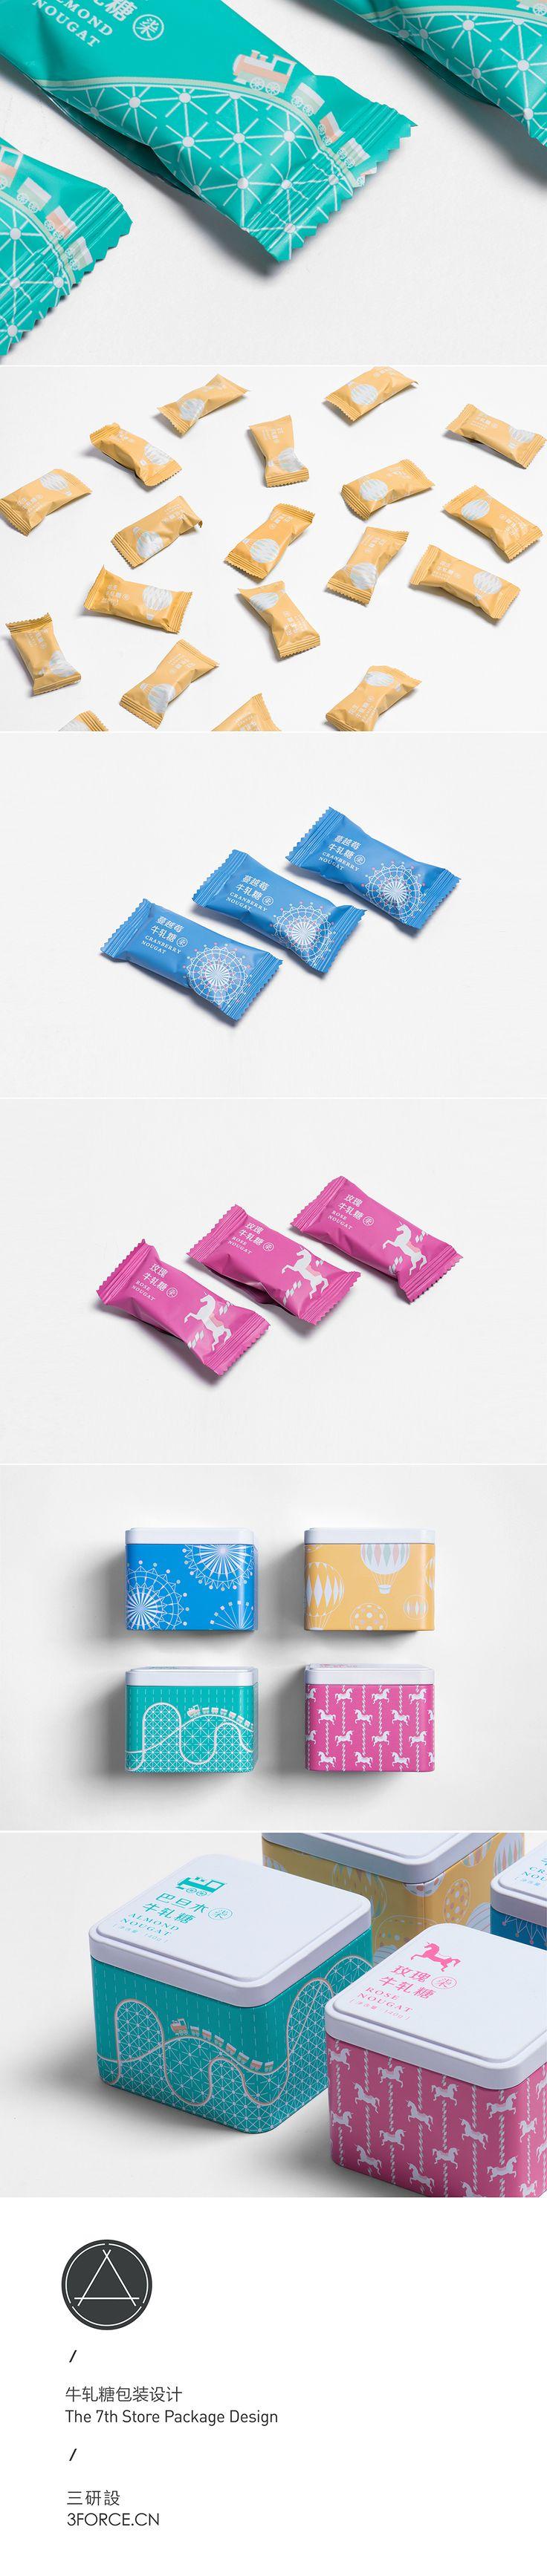 https://www.behance.net/gallery/34018440/The-7th-Store-Nougat-Packaging-